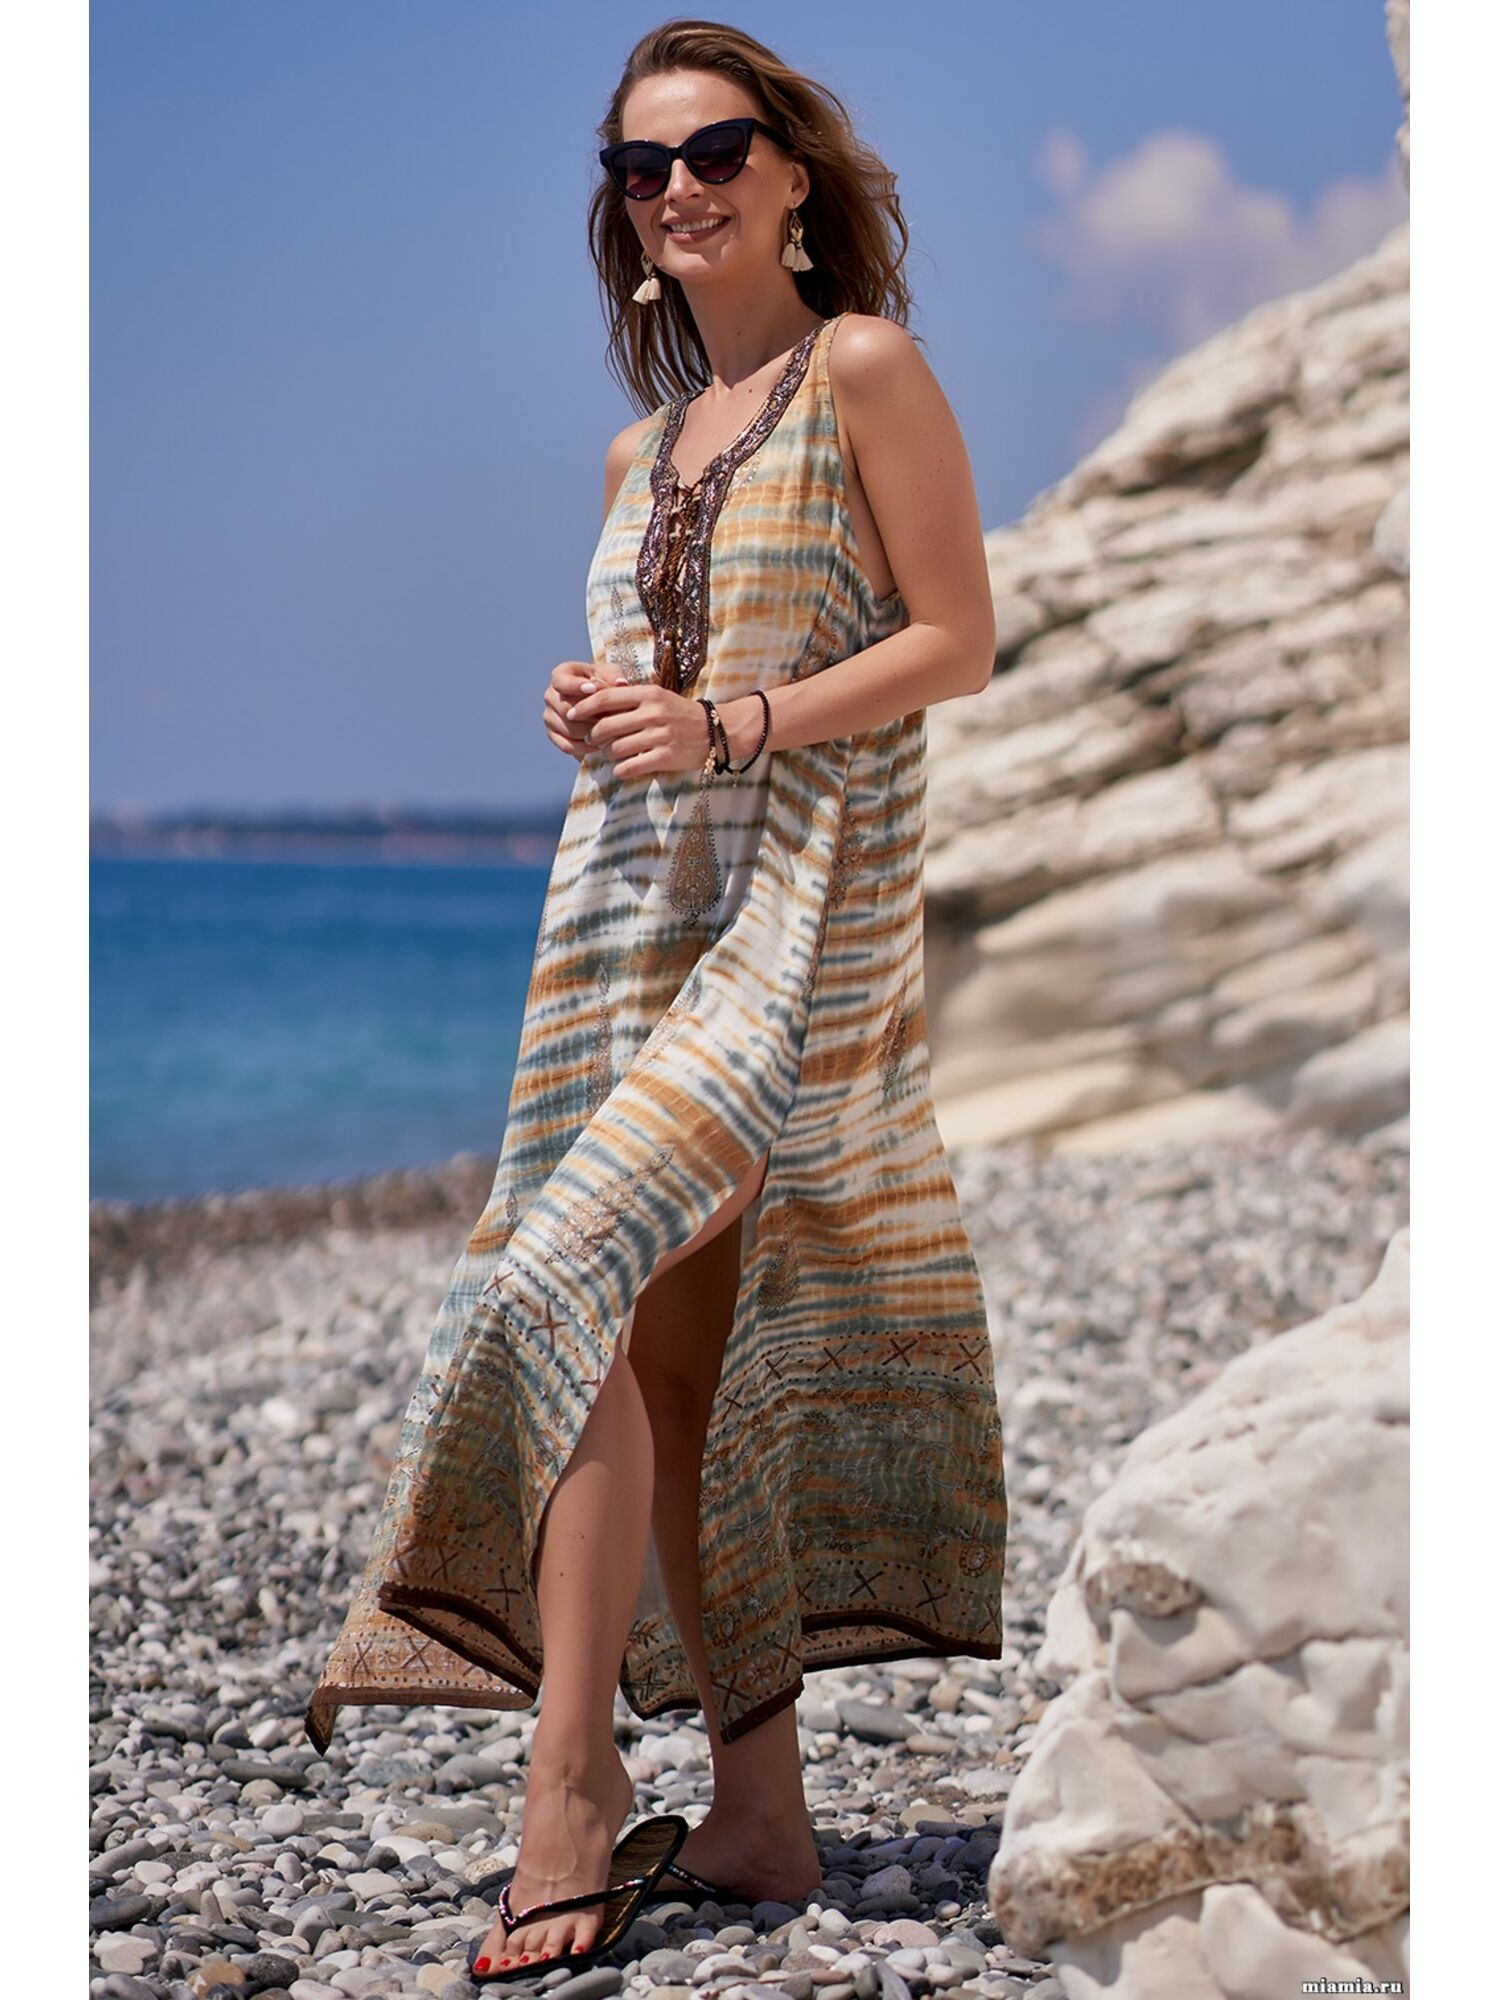 Сарафан, туника пляжная хлопковая Доминикана 1411, мультиколор, Mia-Amore